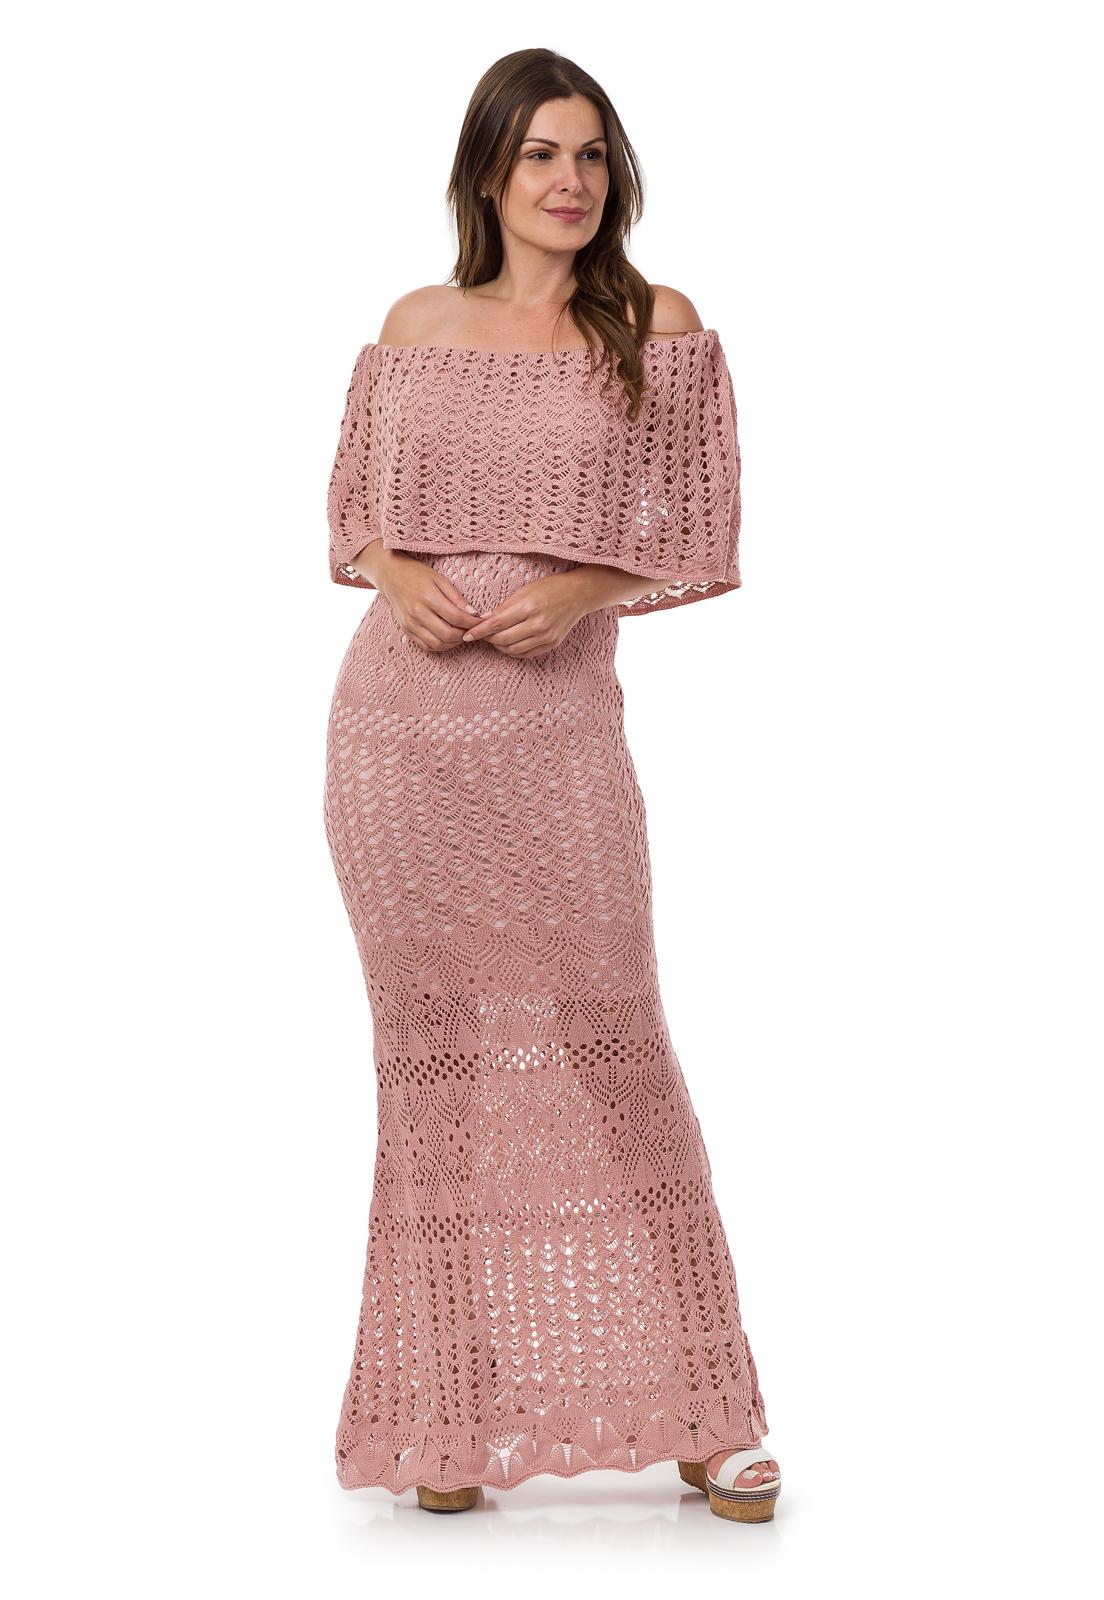 e4d68dcf012b Vestido Longo Feminino Tricot Ombro a Ombro Rosa Claro 04798 no Elo7 | Loja  Pink Tricot (B051A8)